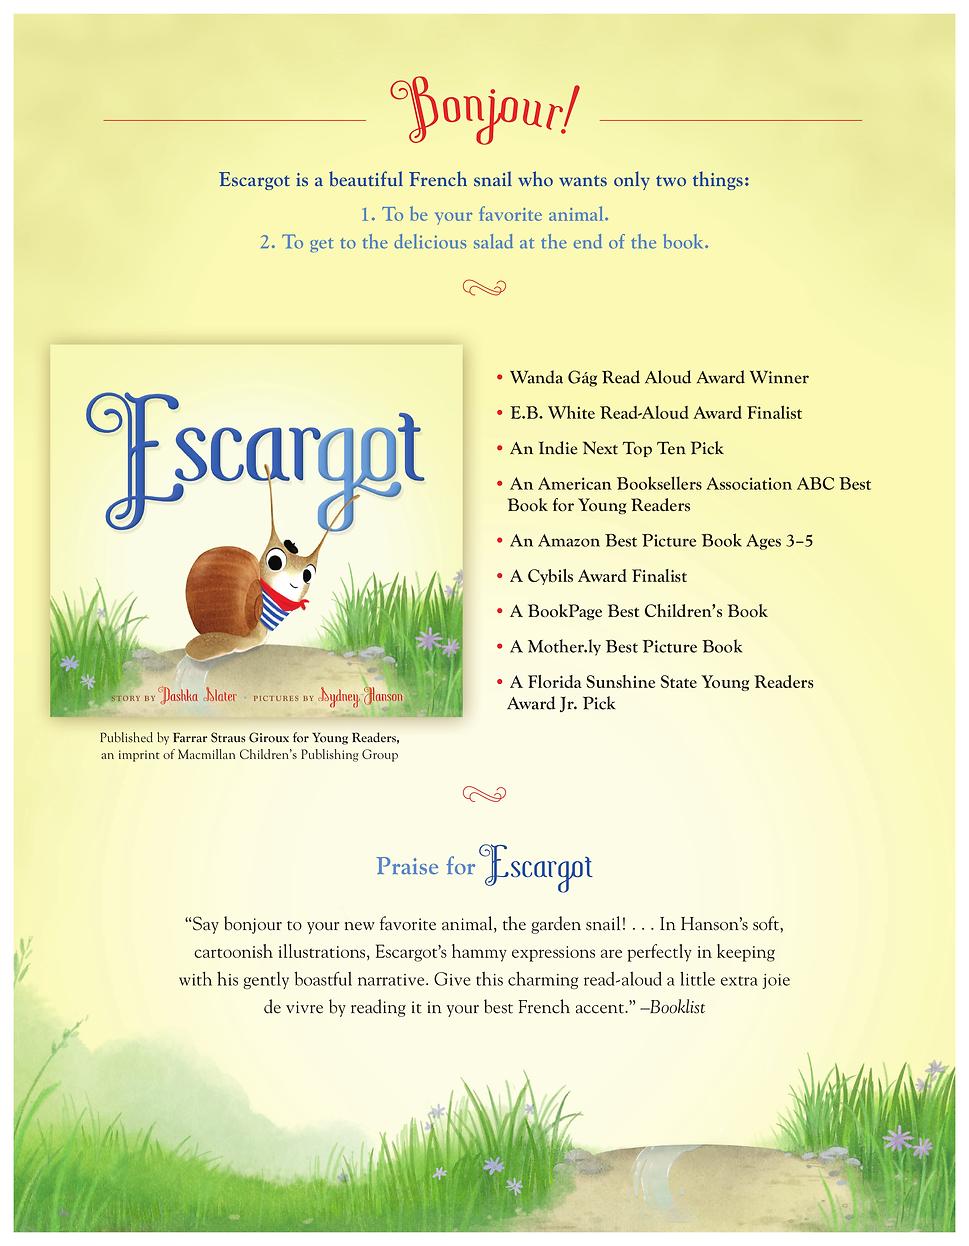 escargot-praise-flyer-designed-7.3.18-1.